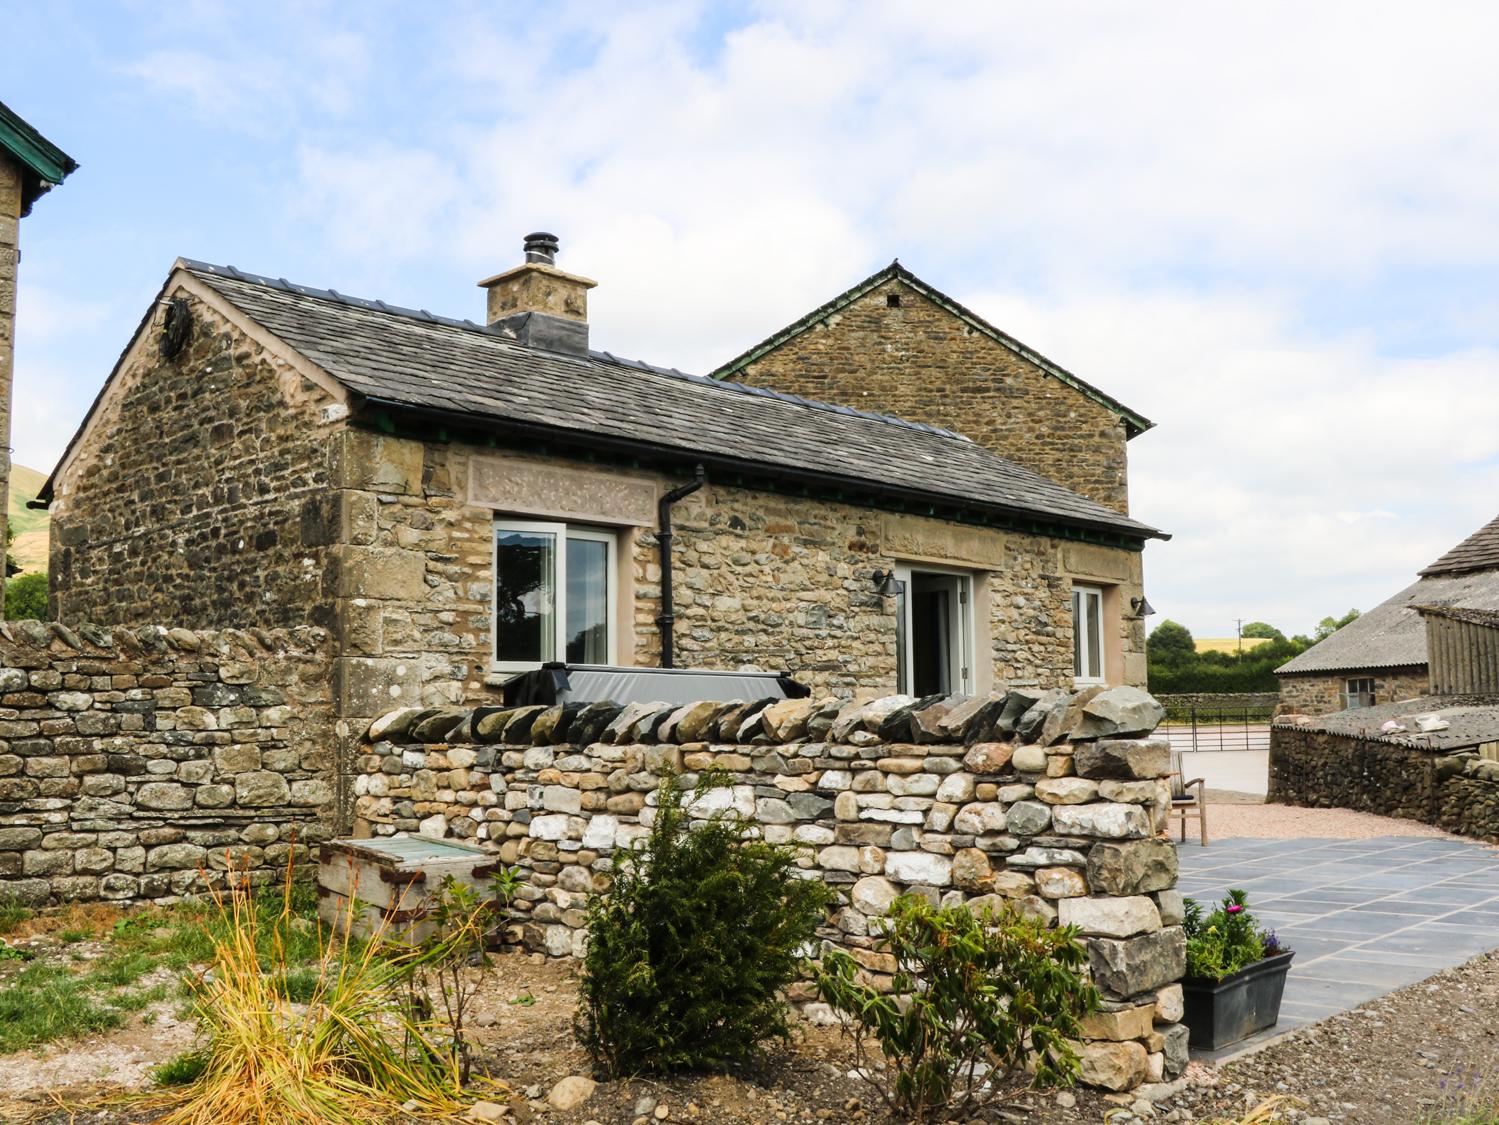 Speight Cottage